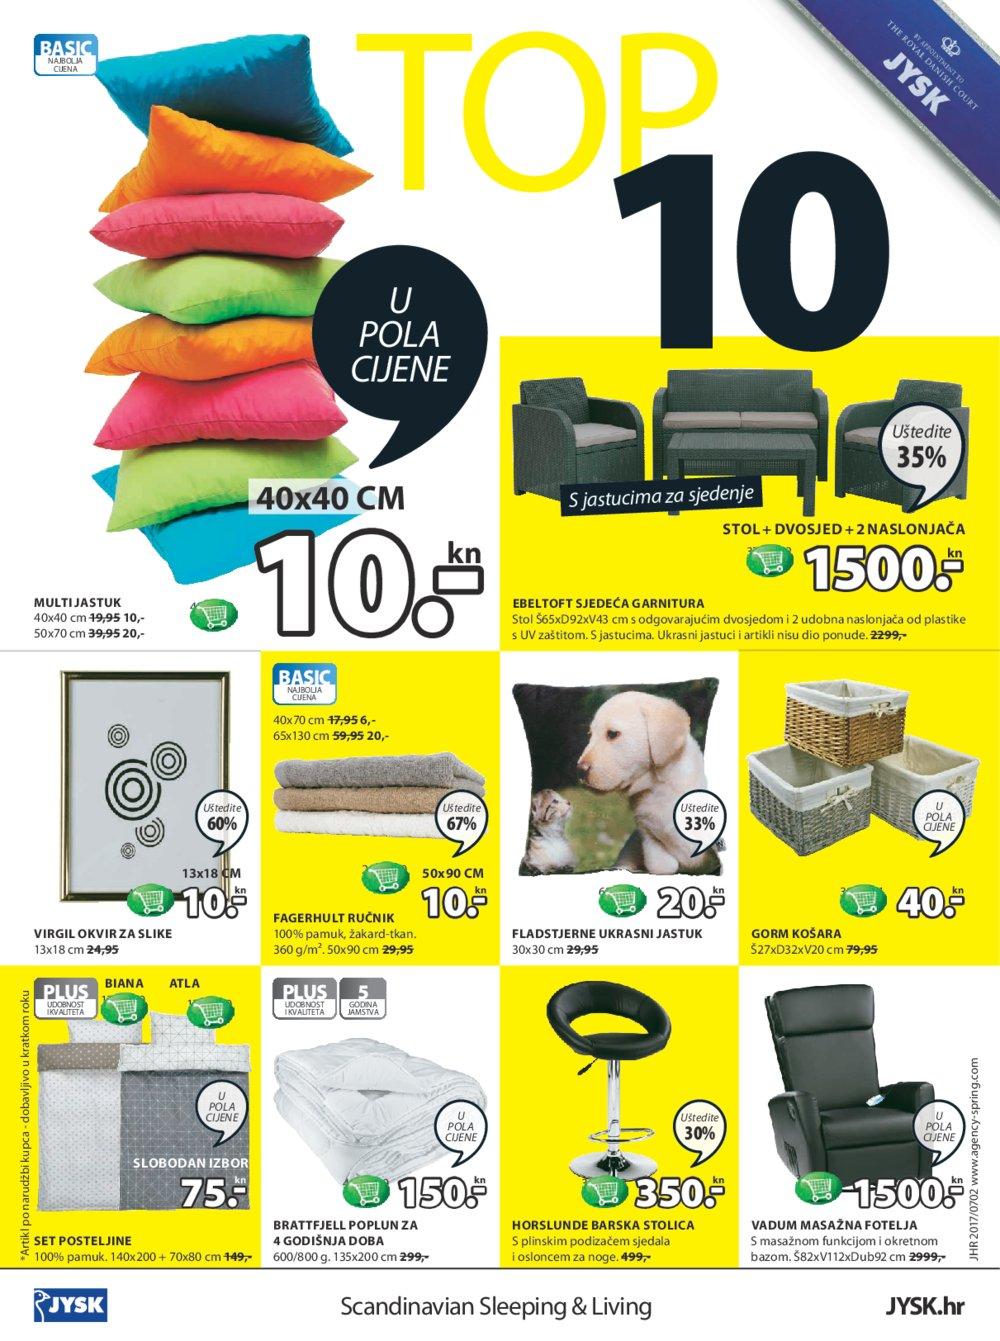 Jysk katalog Rasprodaja i ostale izvrsne ponude 13.07.-26.7.2017.